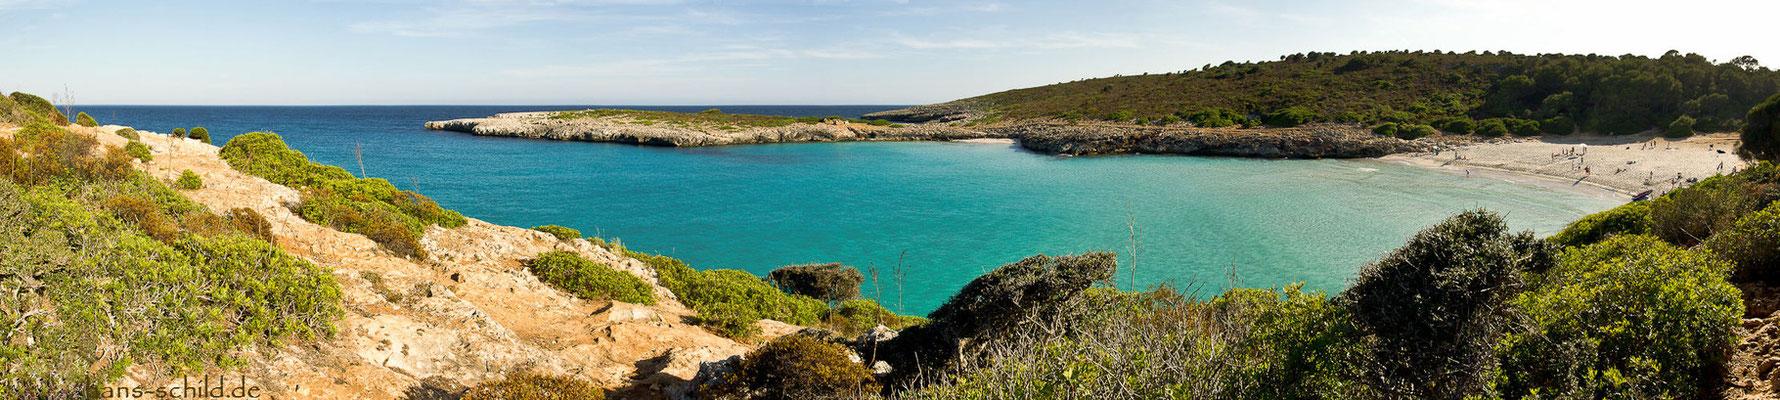 cala varques auf Mallorca